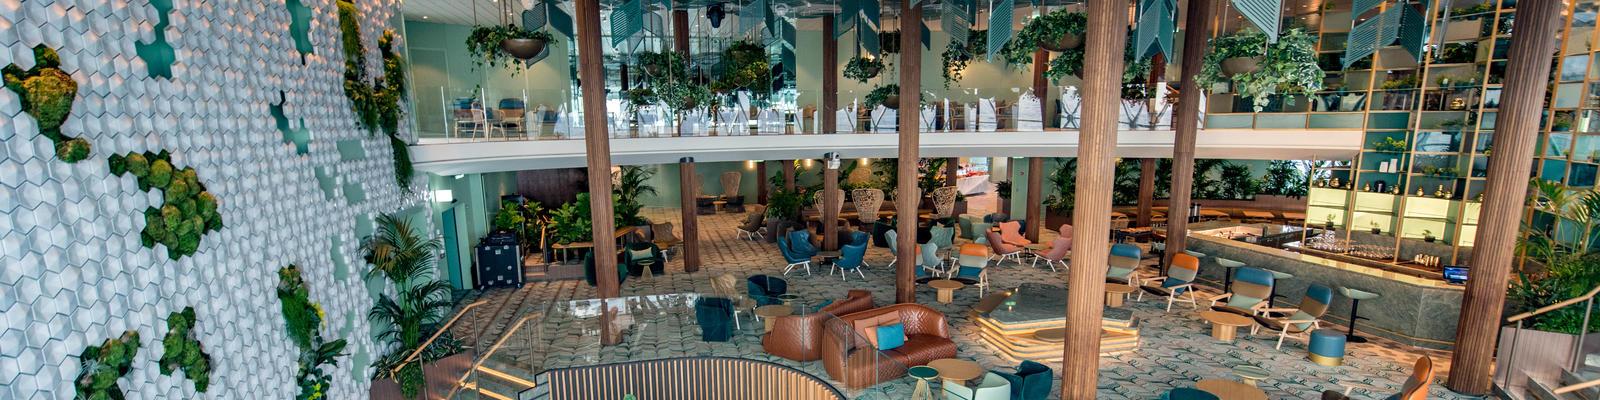 Eden Bar on Celebrity Edge (Photo: Cruise Critic)